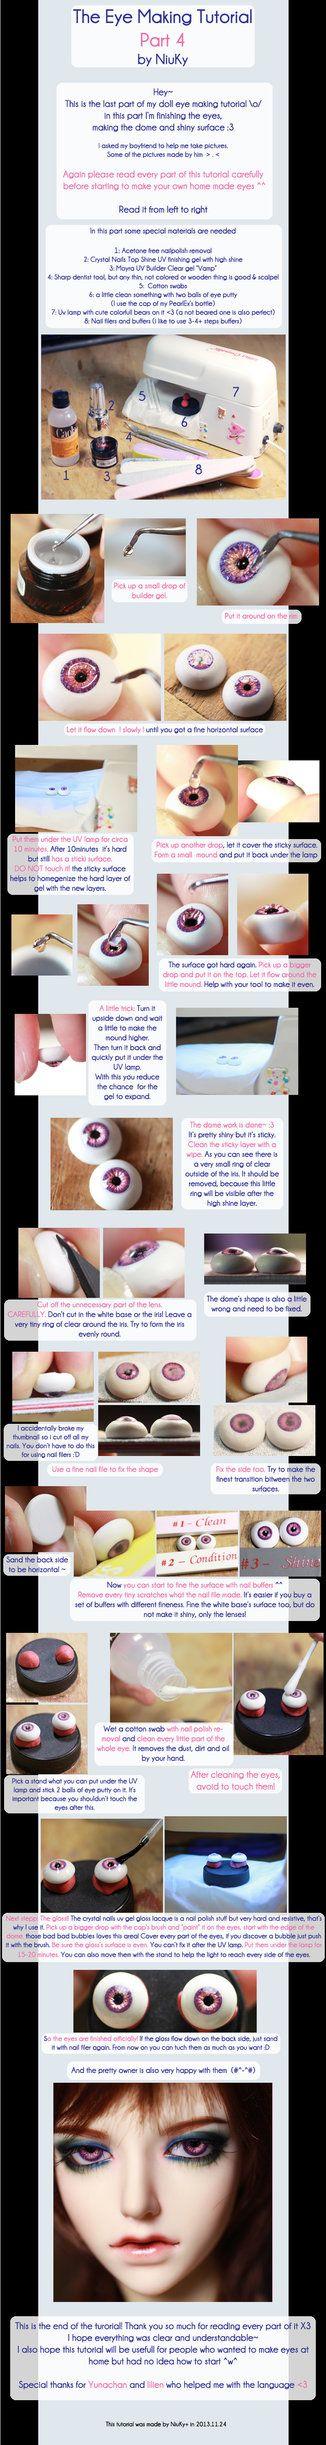 The Eye Making Tutorial 4 by NiuKy on DeviantArt